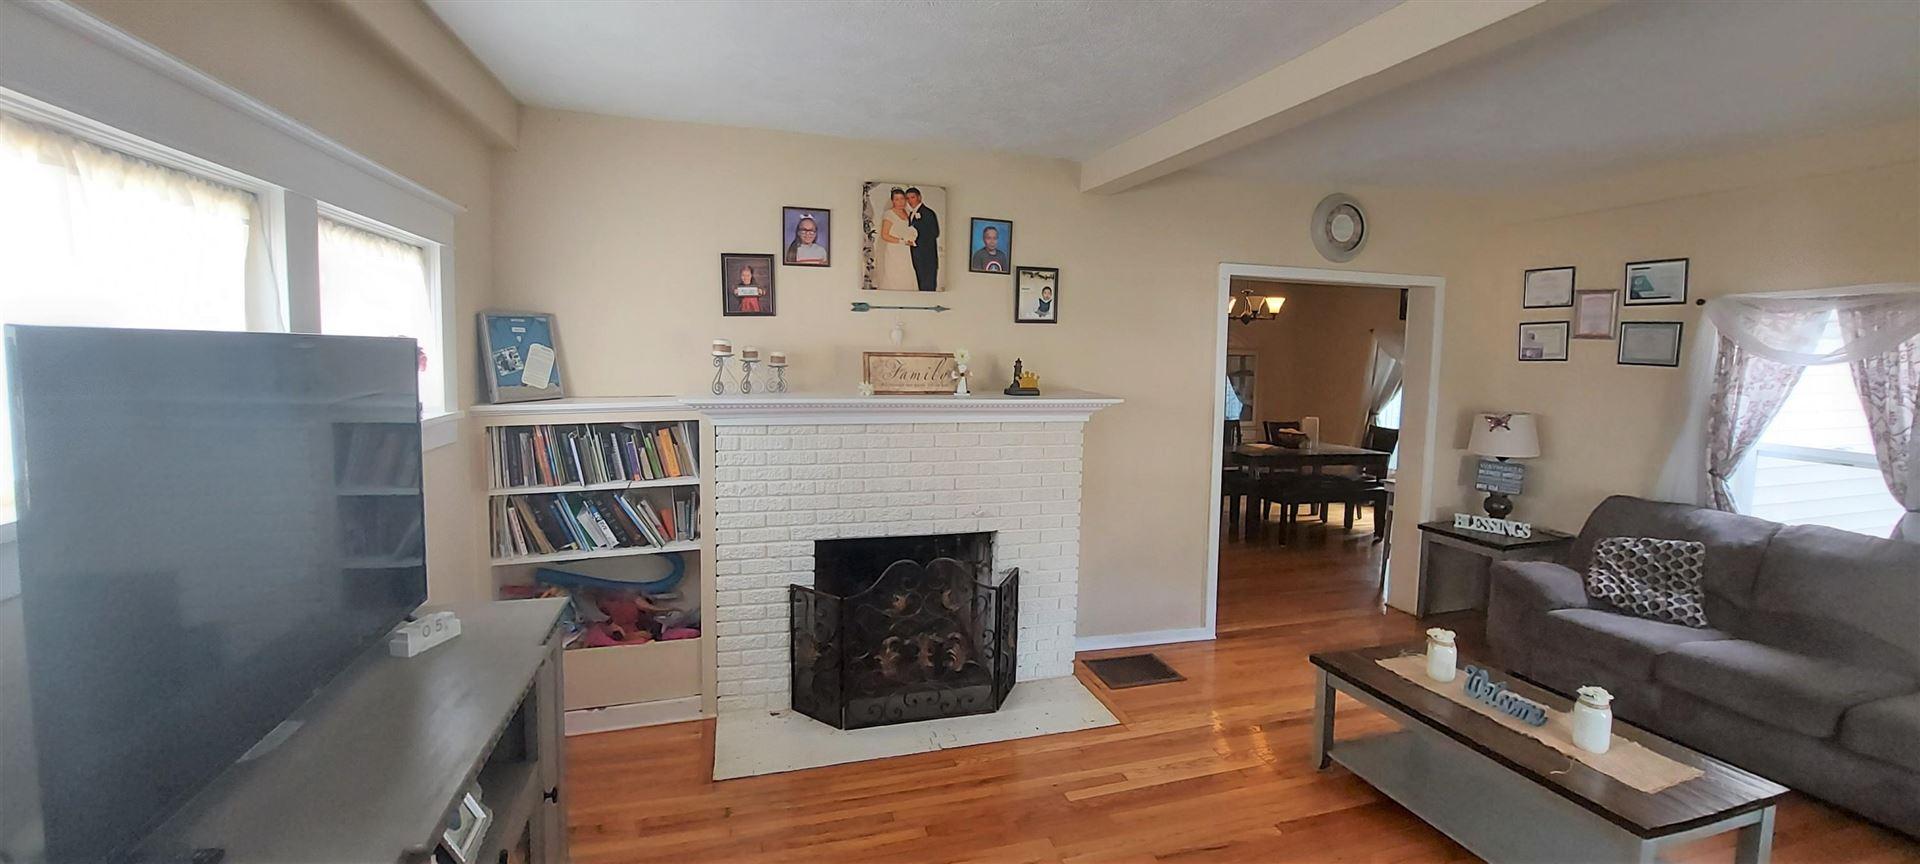 Photo of 257 Monroe Avenue, Muskegon, MI 49441 (MLS # 21094912)